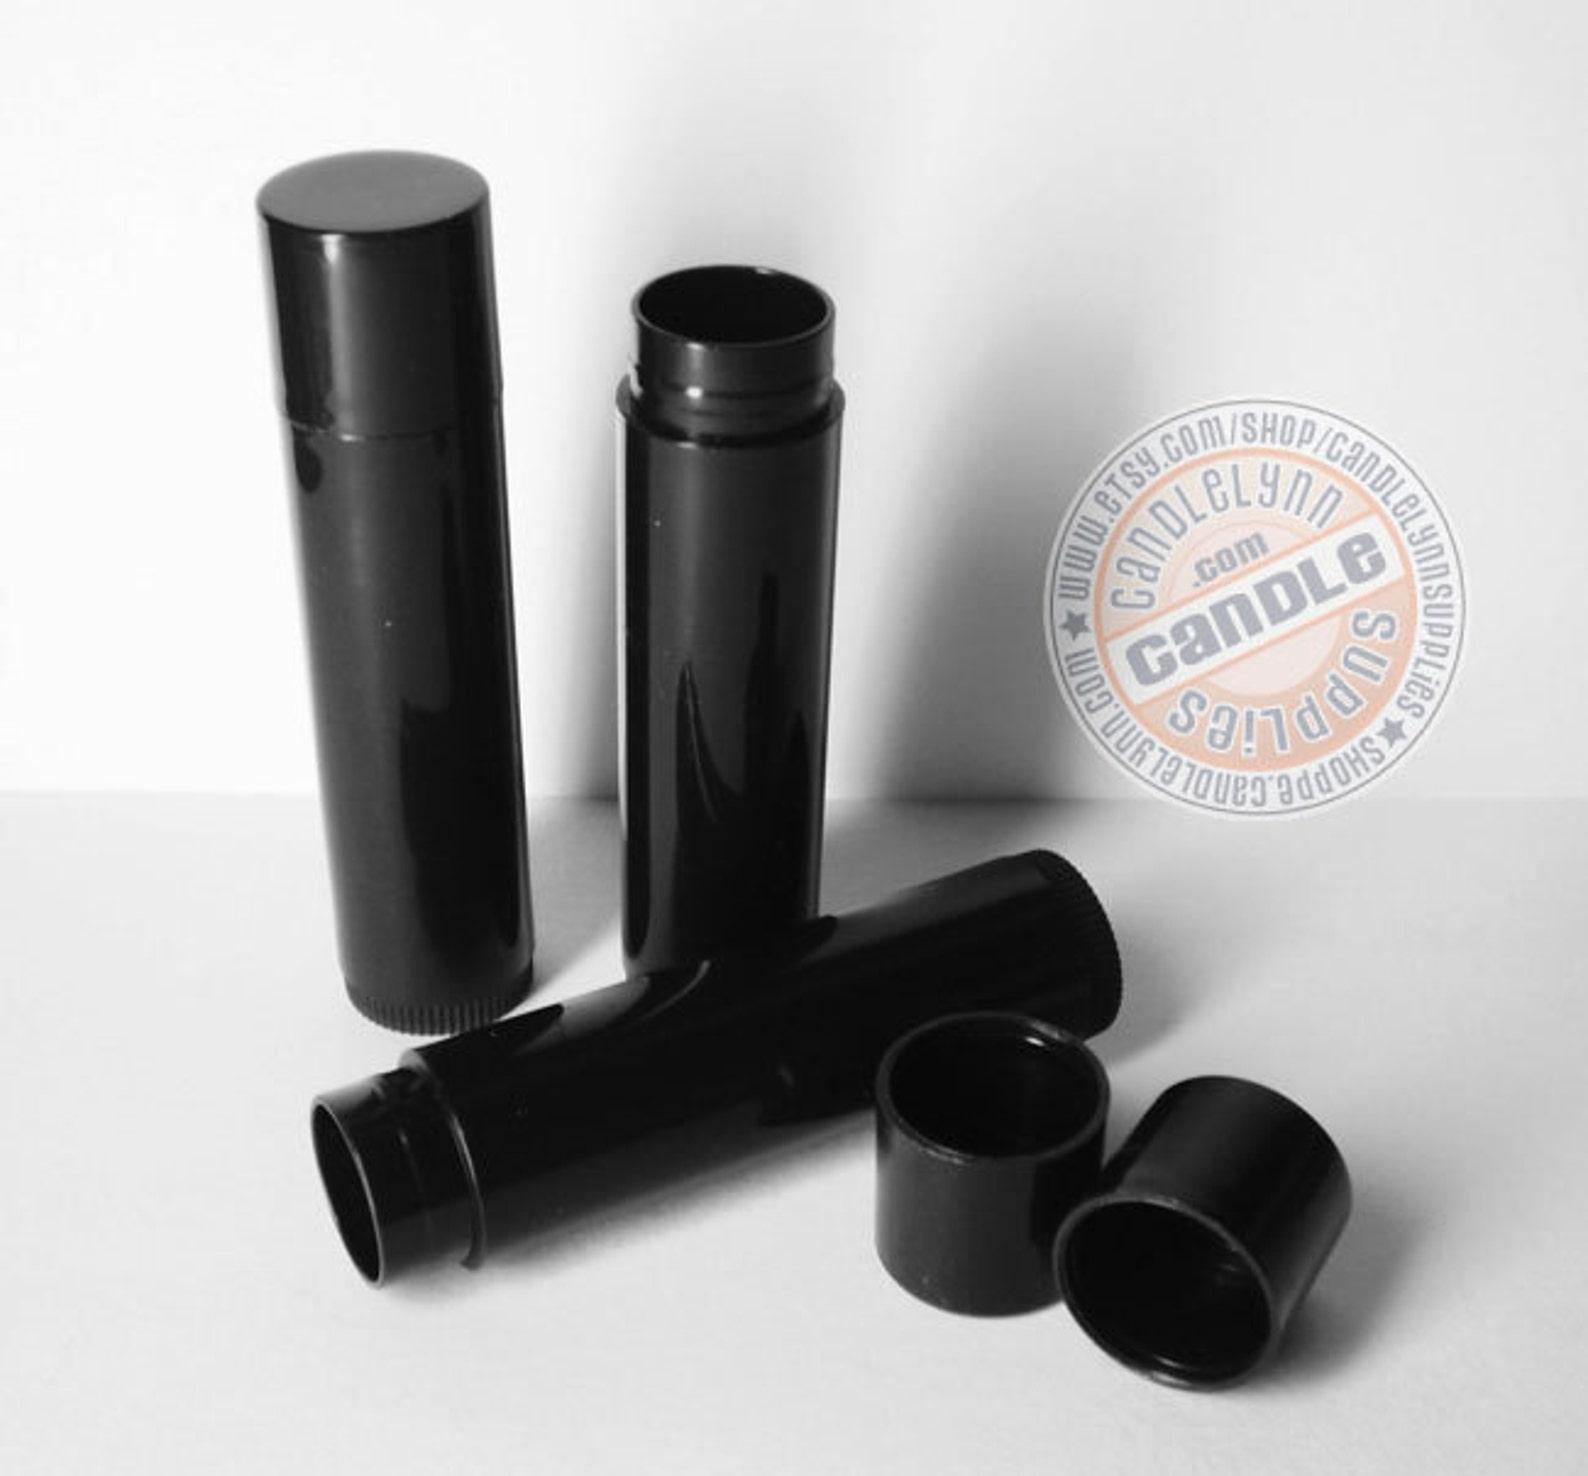 ack black lip balm - HD1588×1476